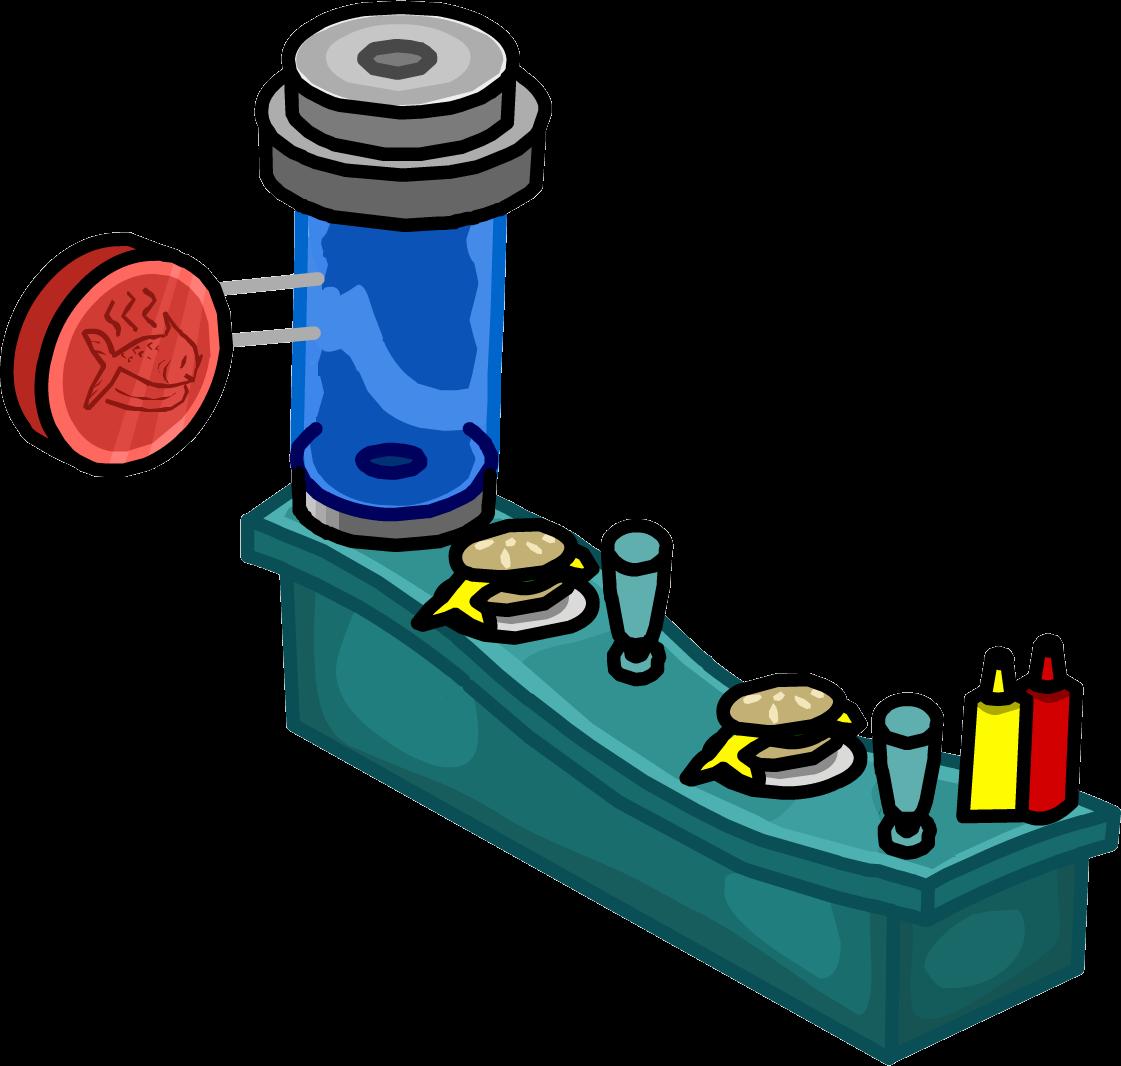 Club penguin wiki fandom. Diner clipart diner counter